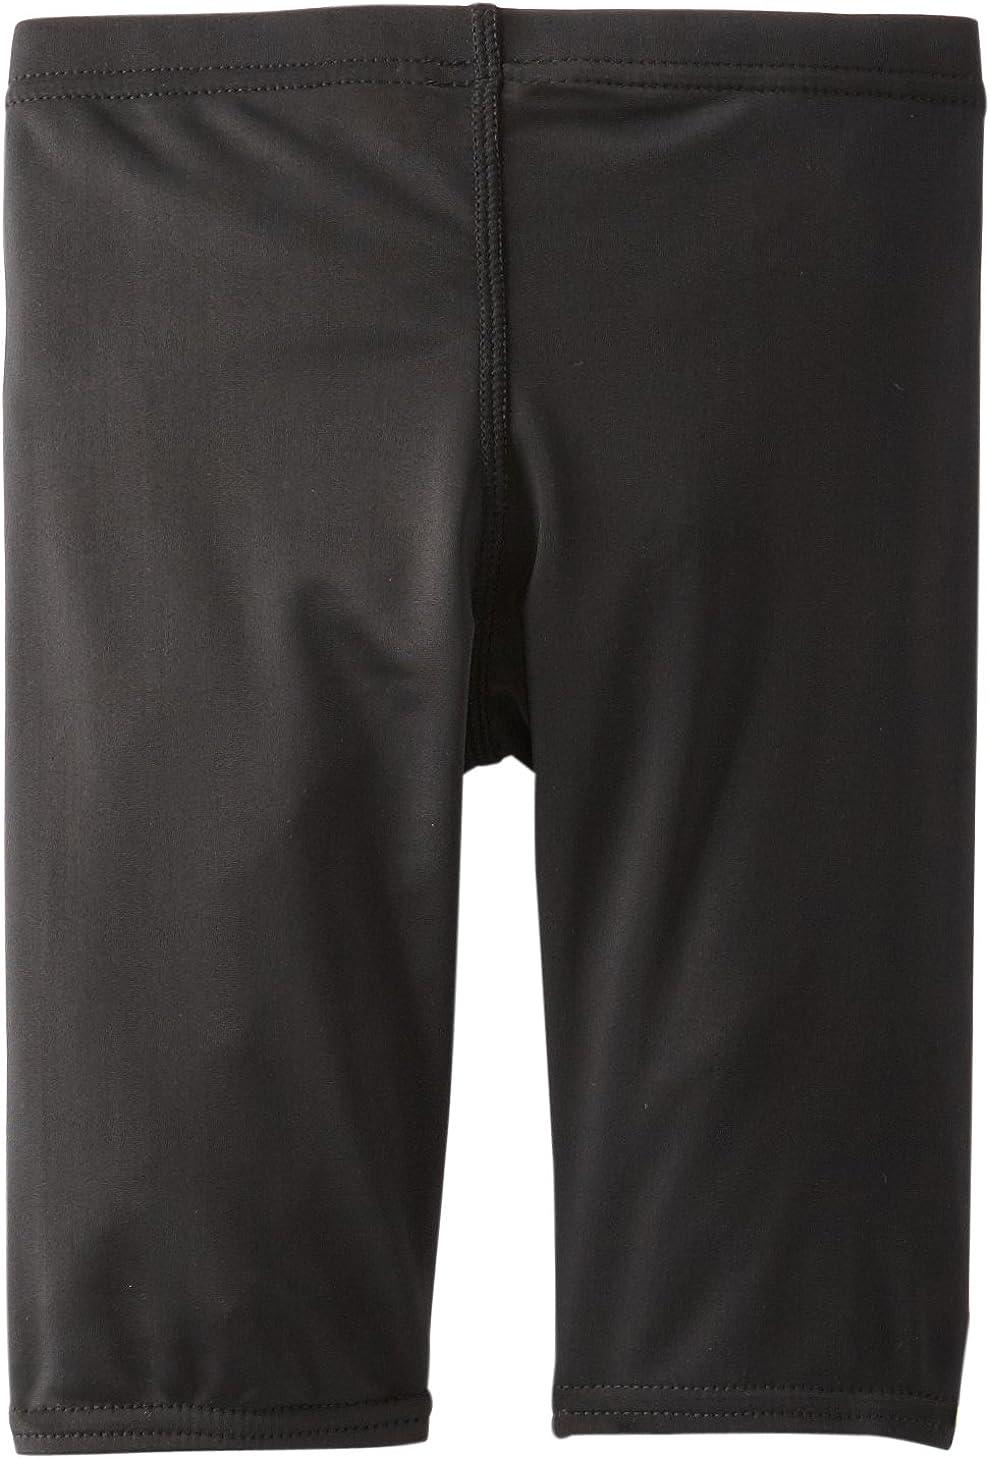 Nike Big Boys 8|inch Volleyball Shorts Trunk Small Black